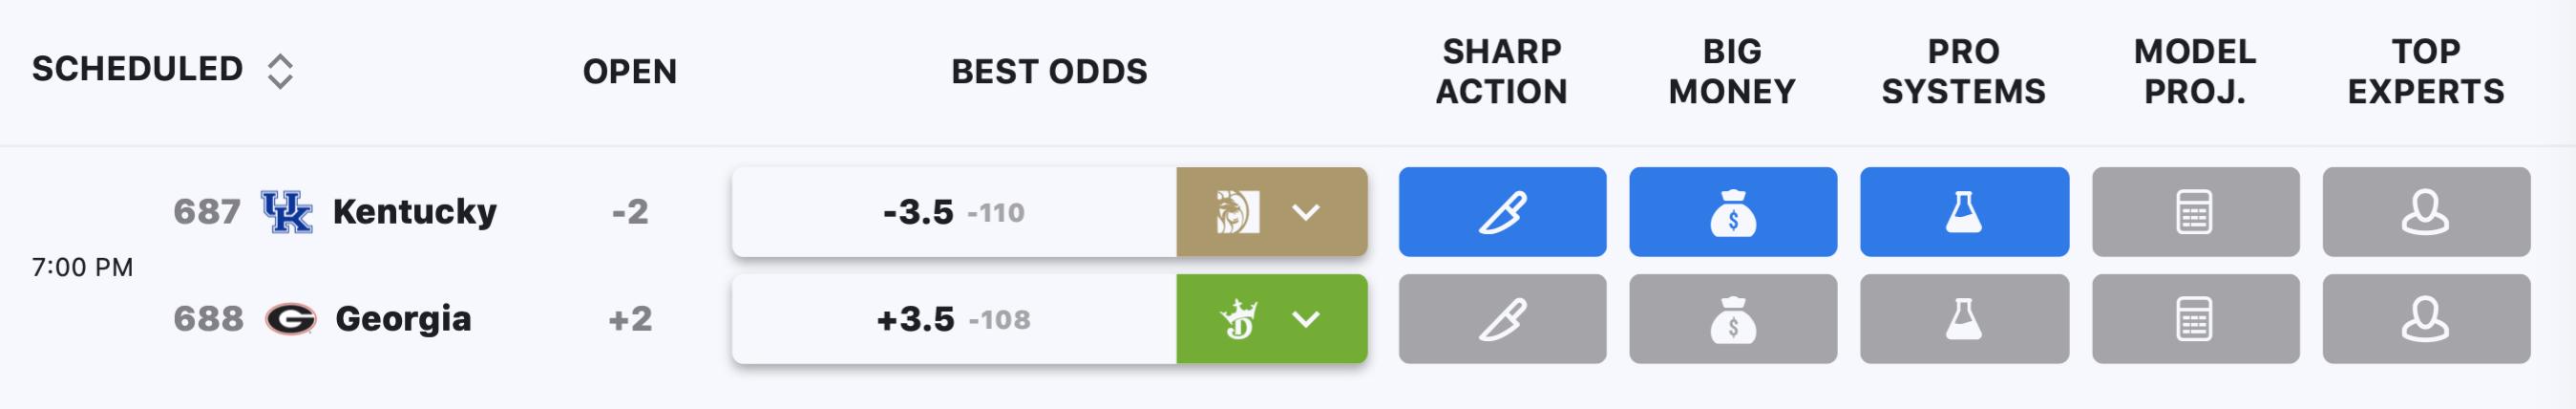 Ncaab betting percentages always bet on green stardew